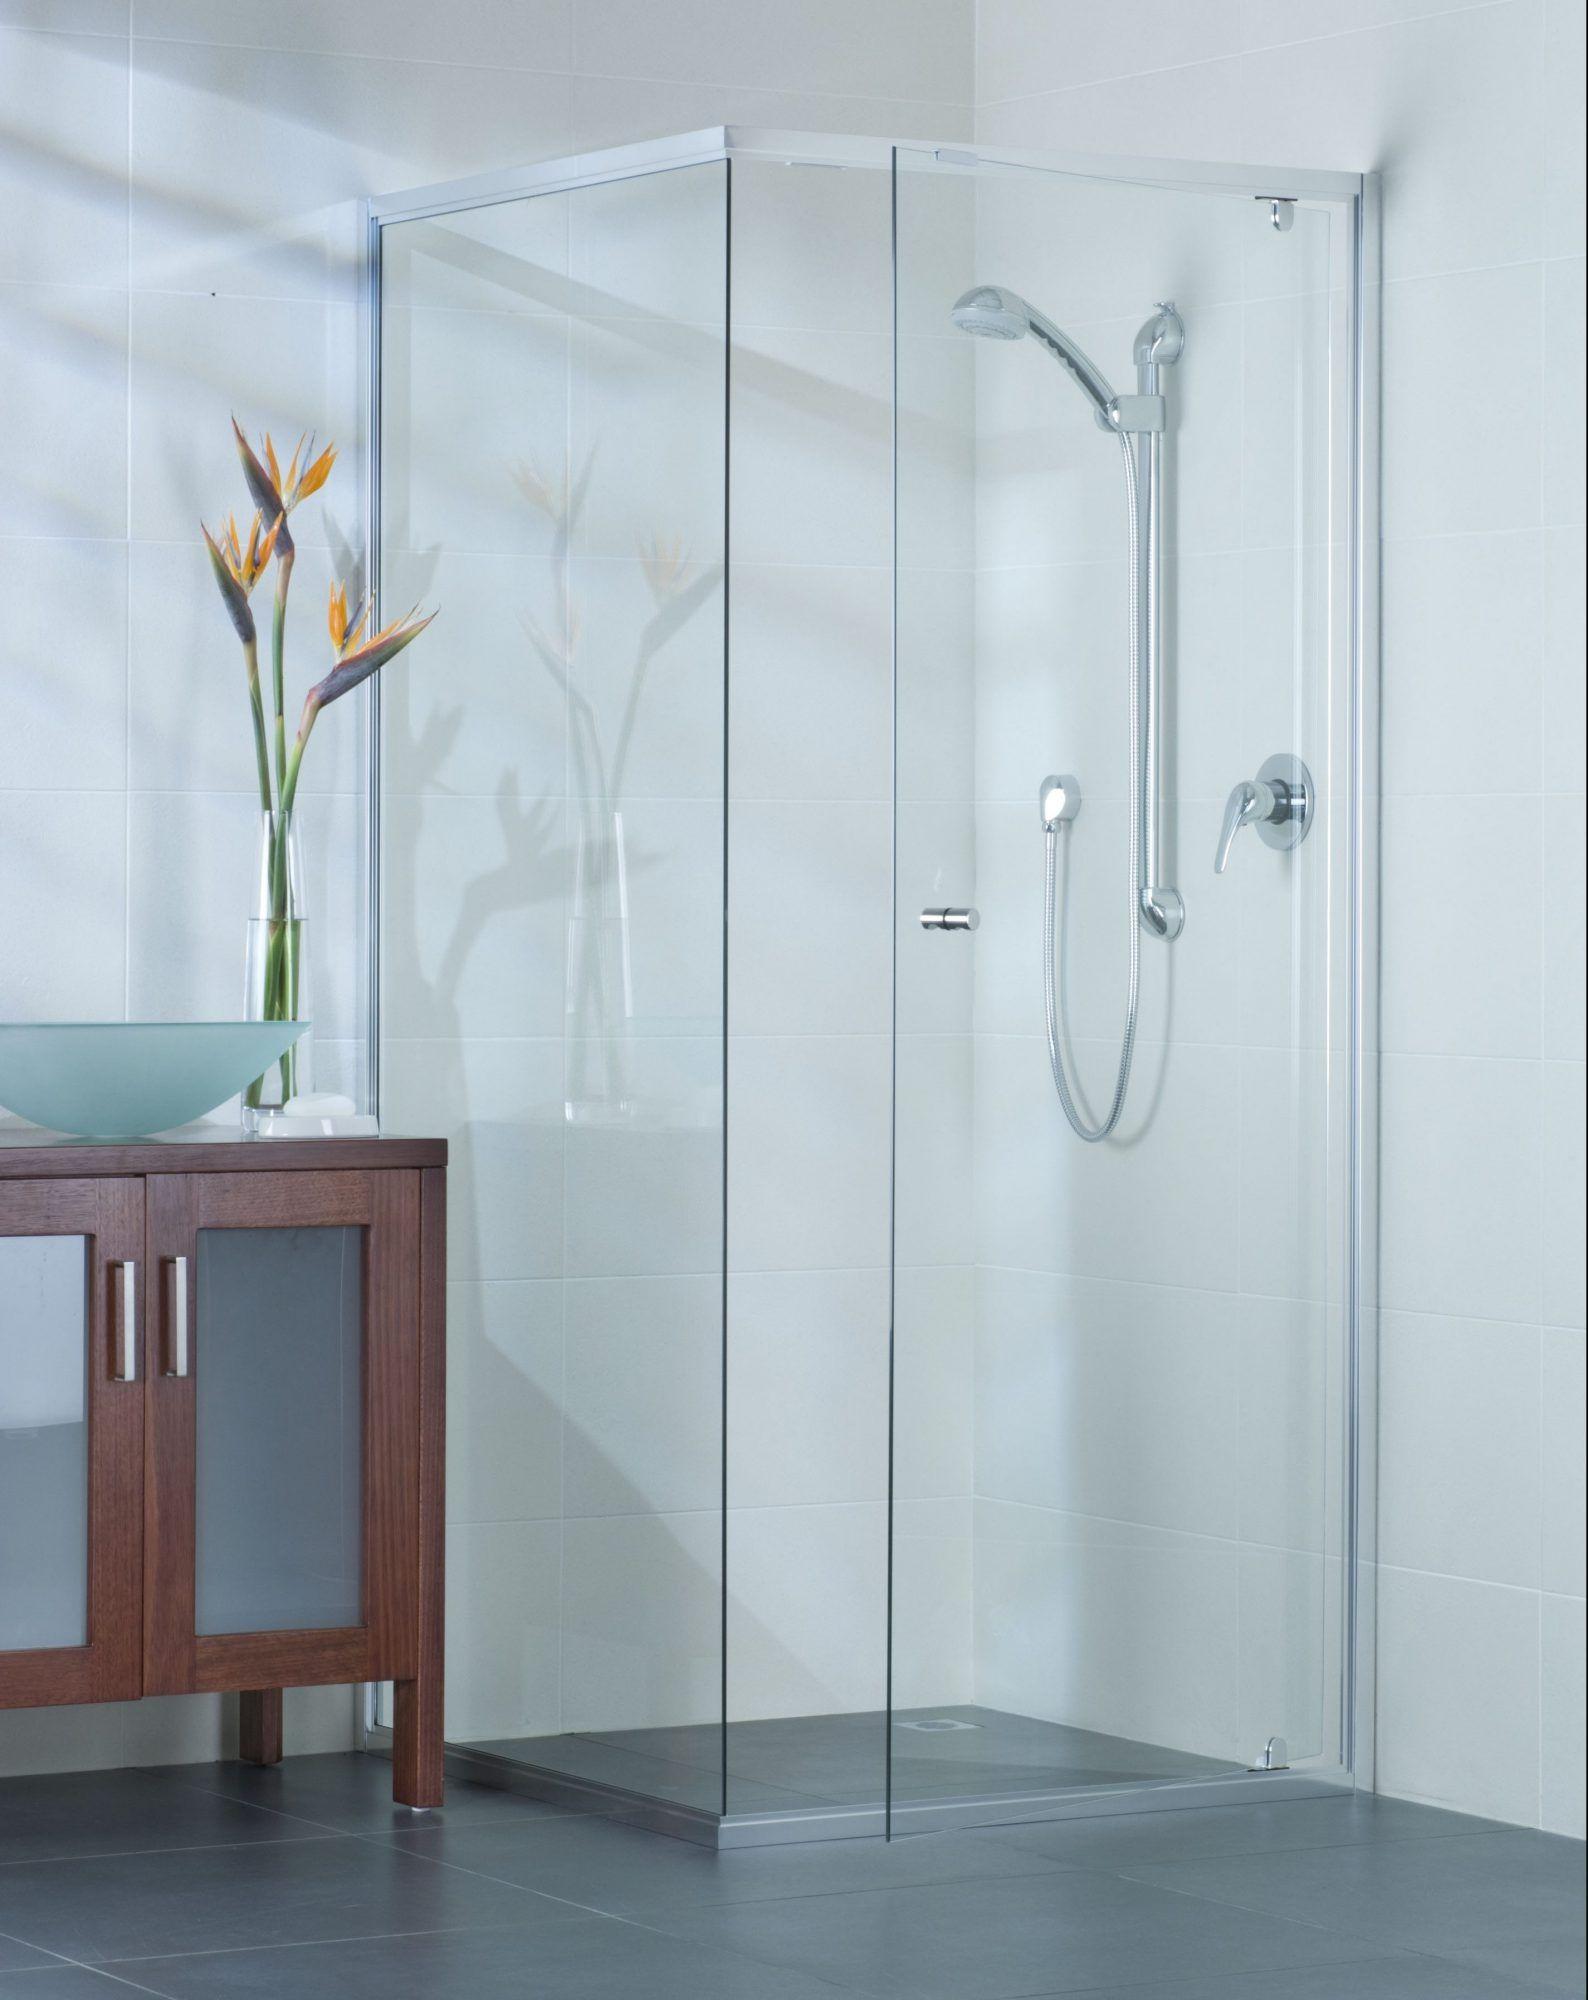 Unique Shower Screen Door Embellishment - Bathtub Ideas - dilata.info